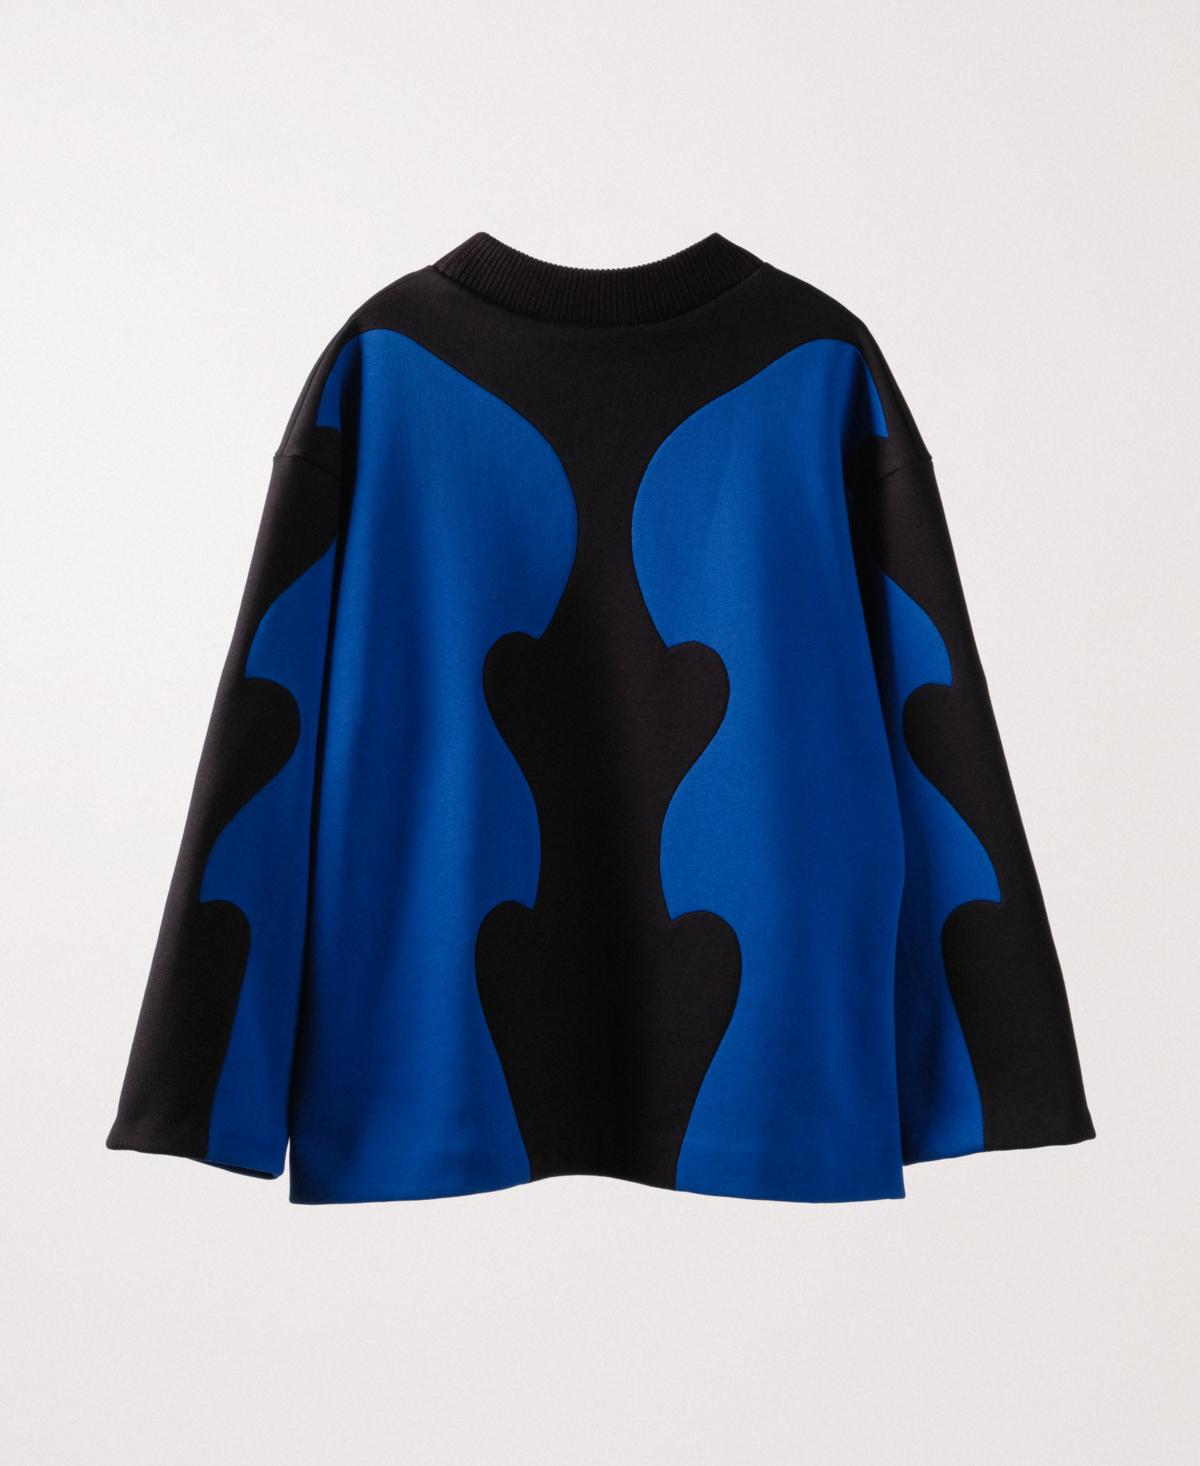 Bowie Kiss Black Sweatshirt